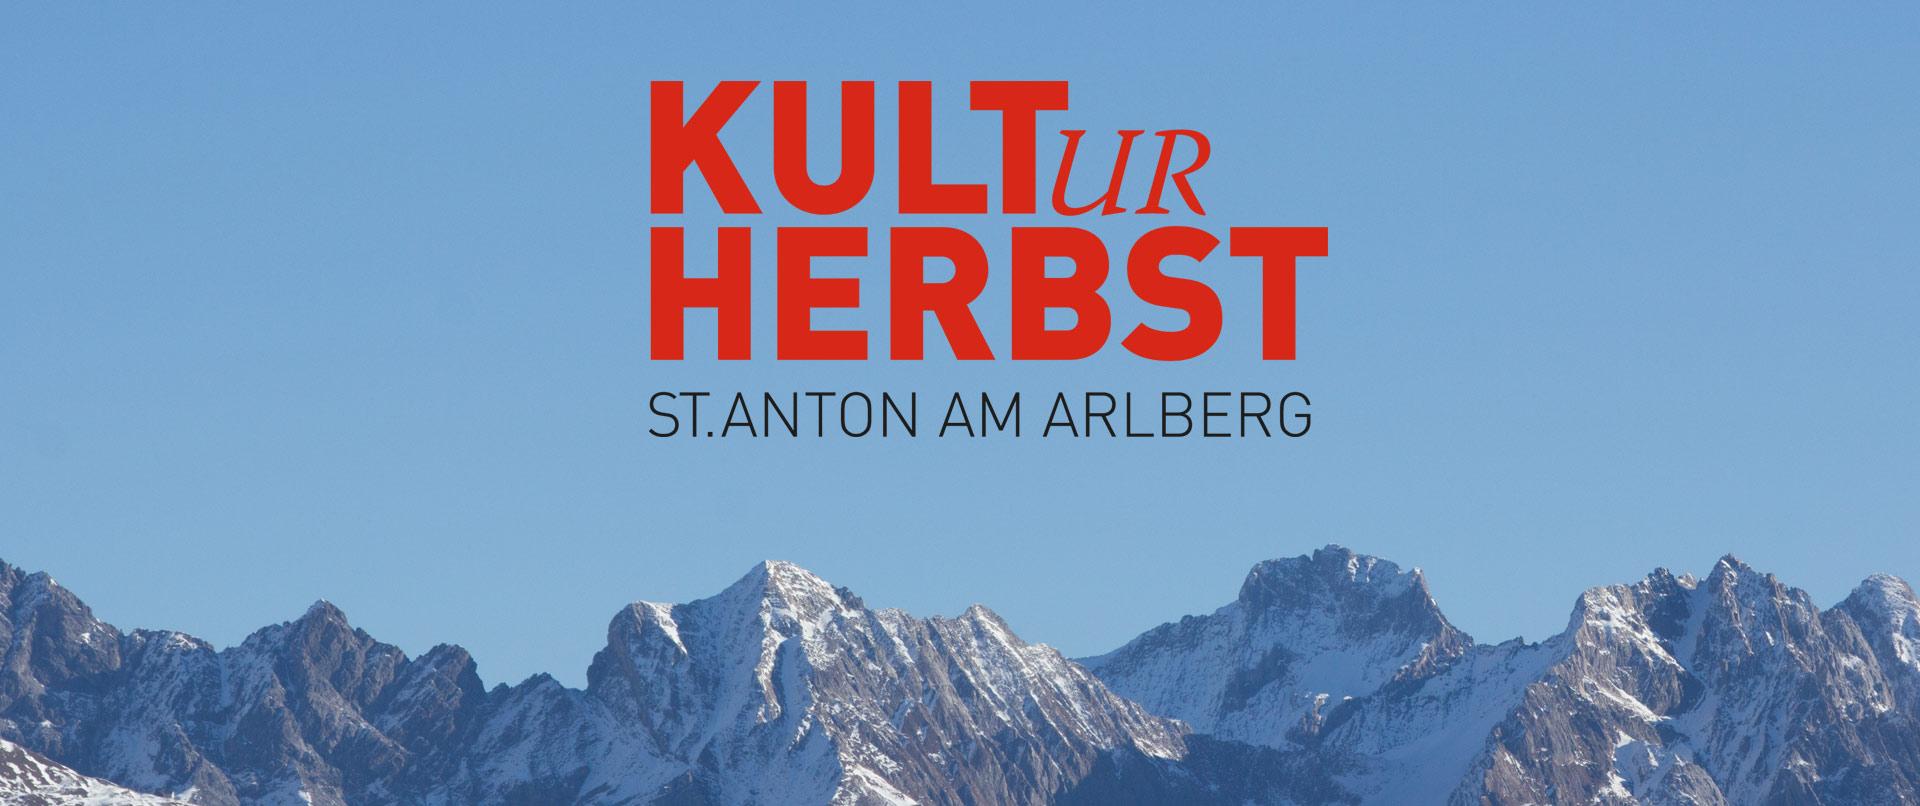 Der KULTurherbst in St. Anton am Arlberg